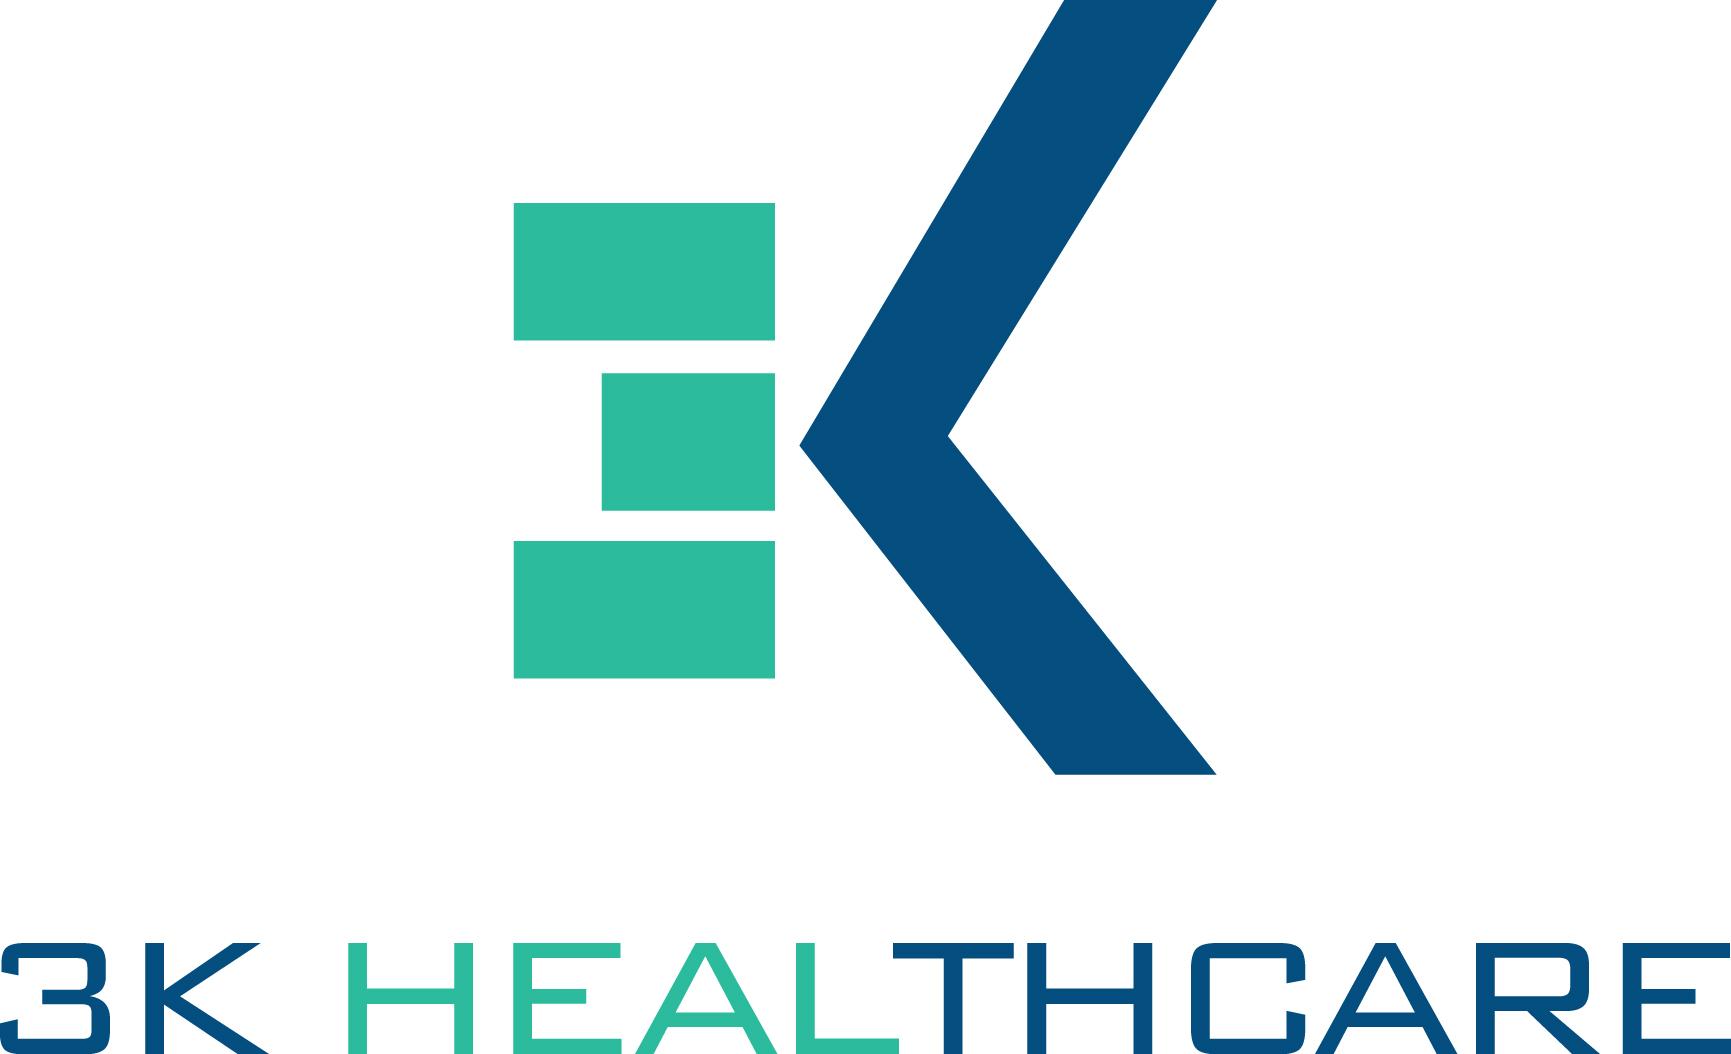 3K Health Care Pvt. Ltd.